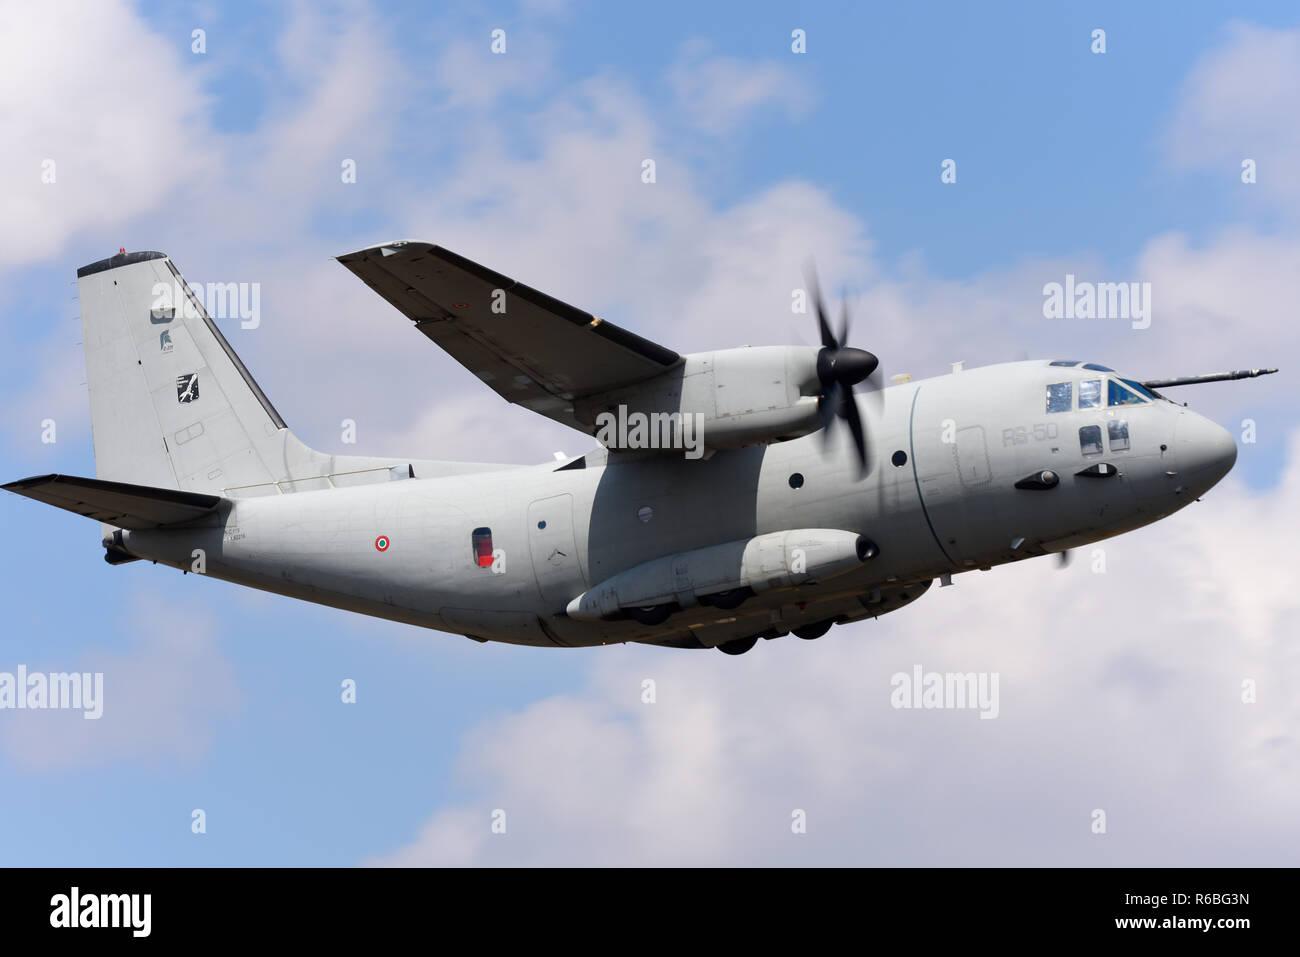 Italian Air Force Aeronautica Militare Alenia C-27J Spartan transport plane flying at the Royal International Air Tattoo, RIAT, RAF Fairford airshow. Stock Photo